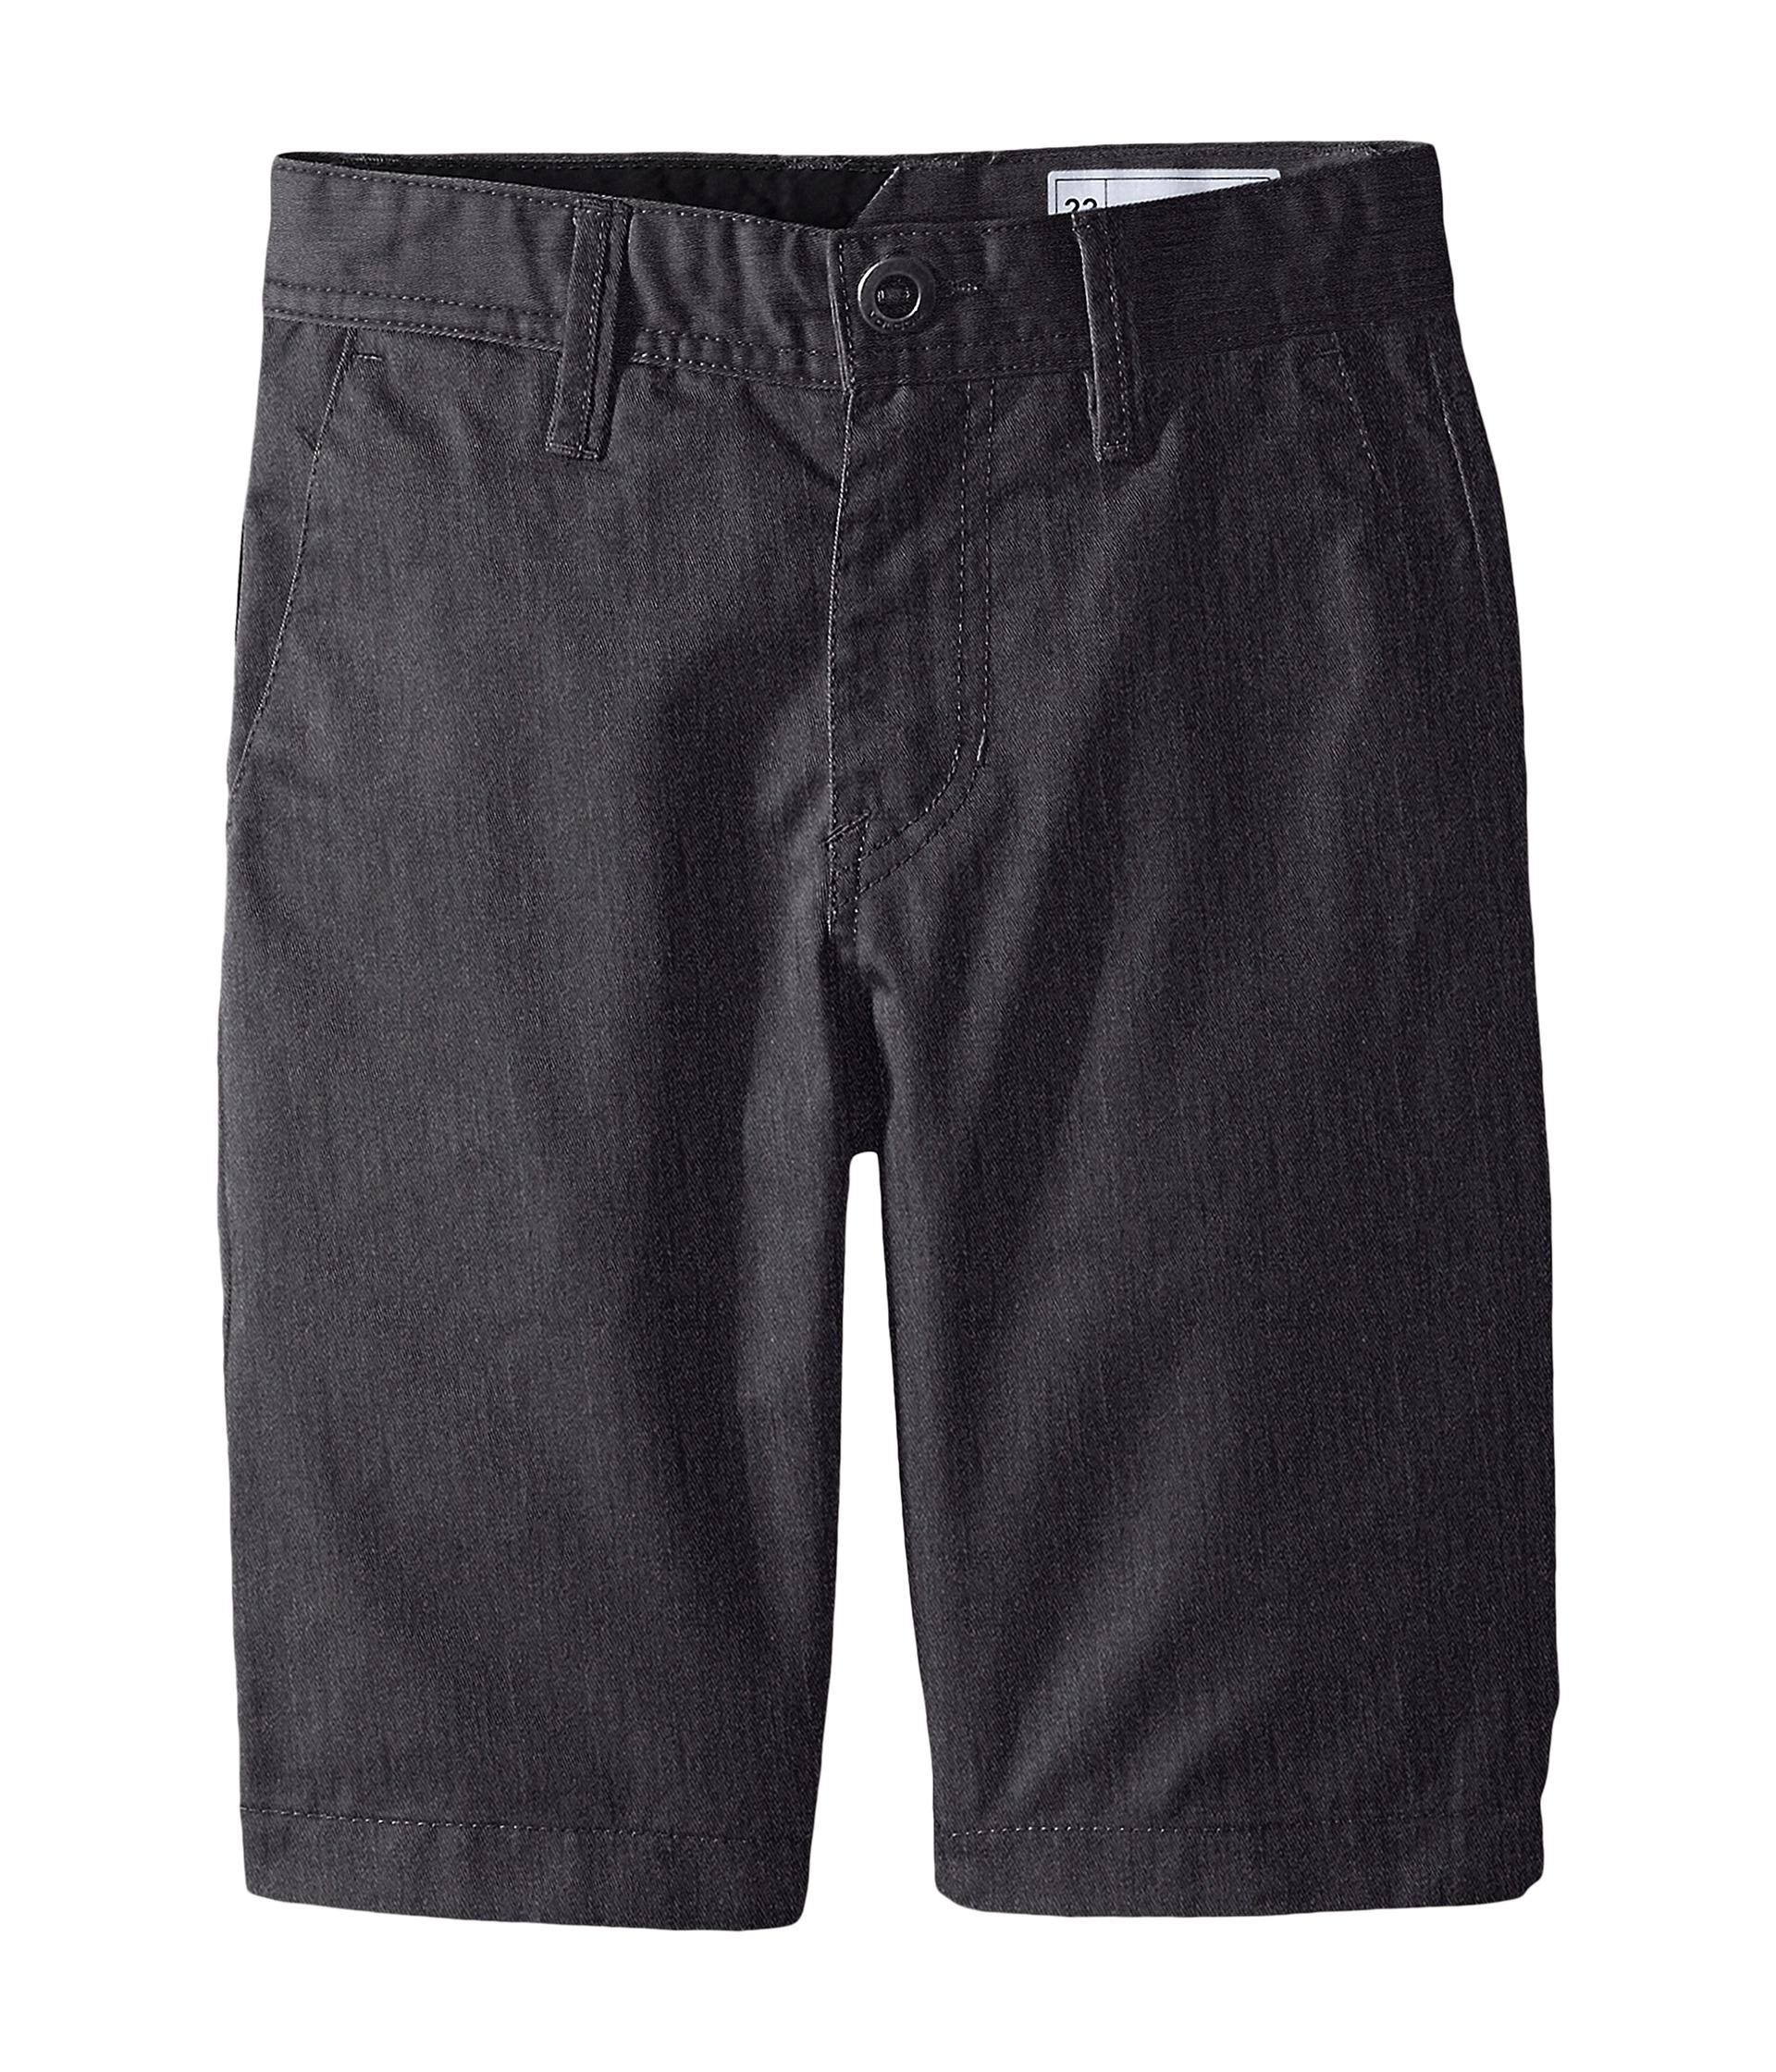 TC-6-Shorts-2017-6-19